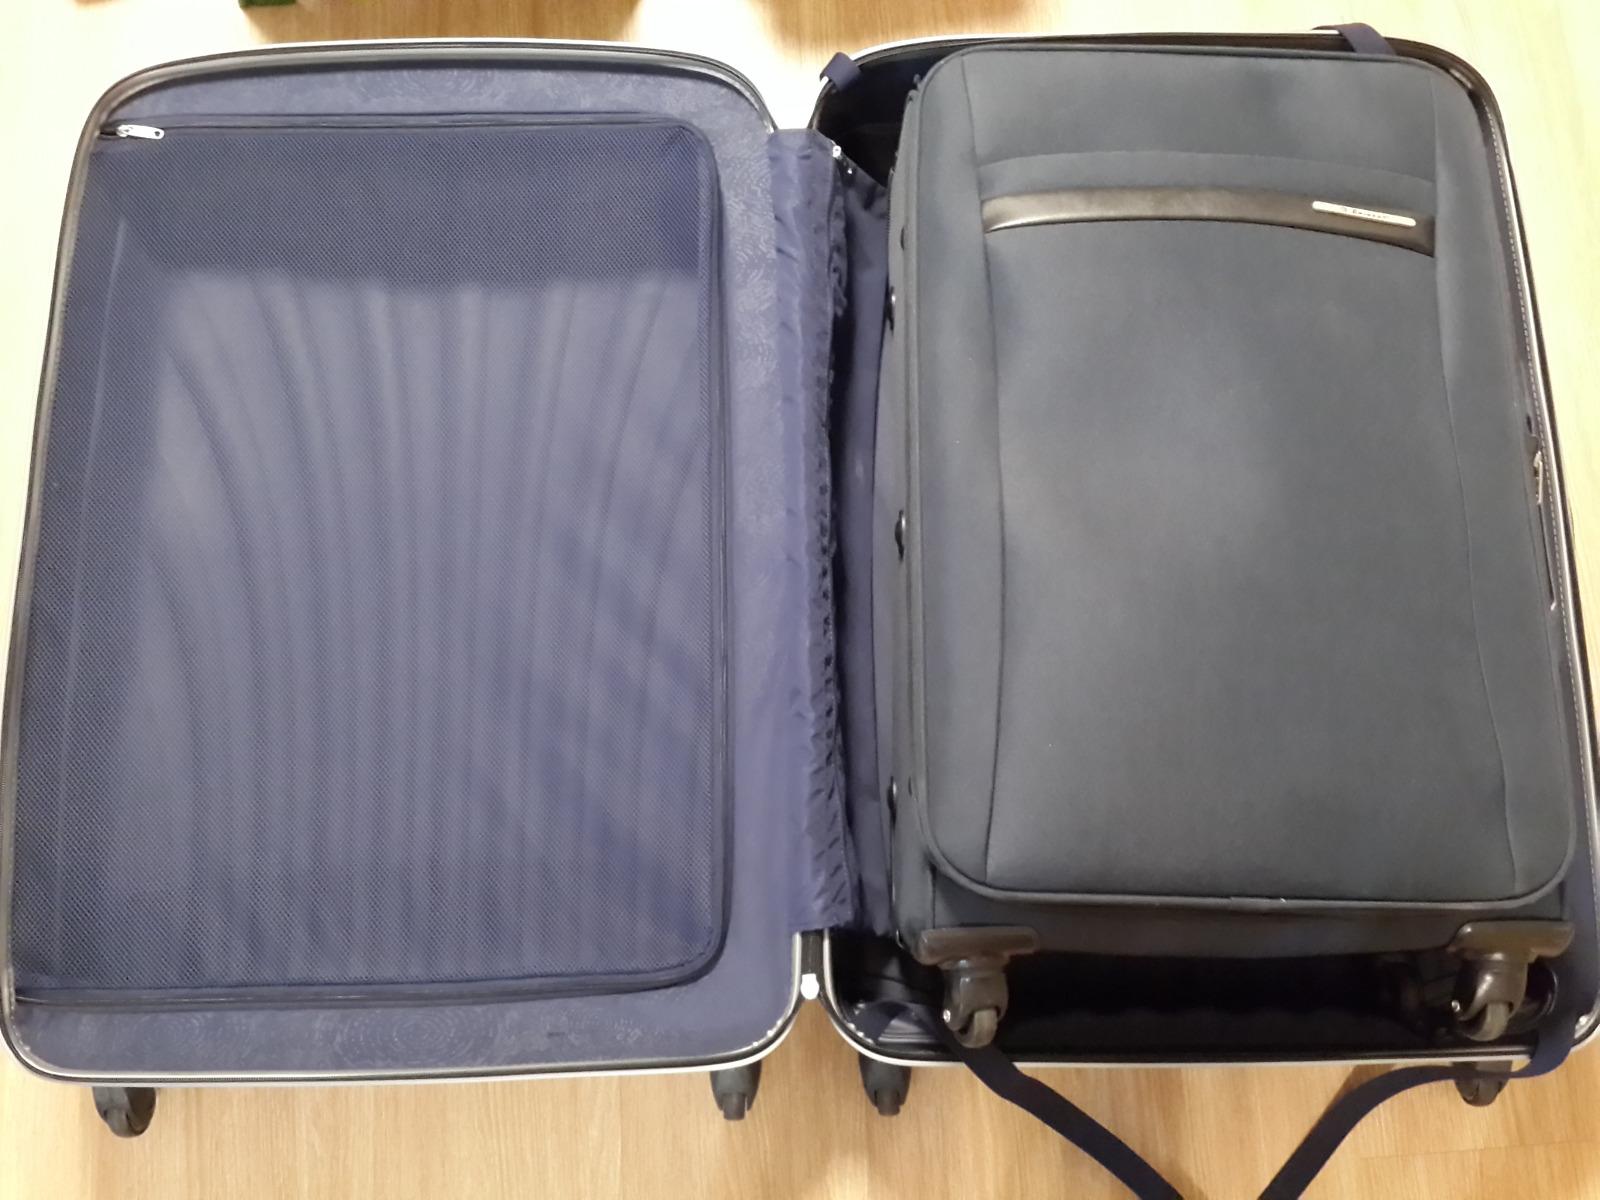 Joey的奮鬥 Samsonite 貝殼箱 Cosmolite 行李箱的感想與一些資料整理